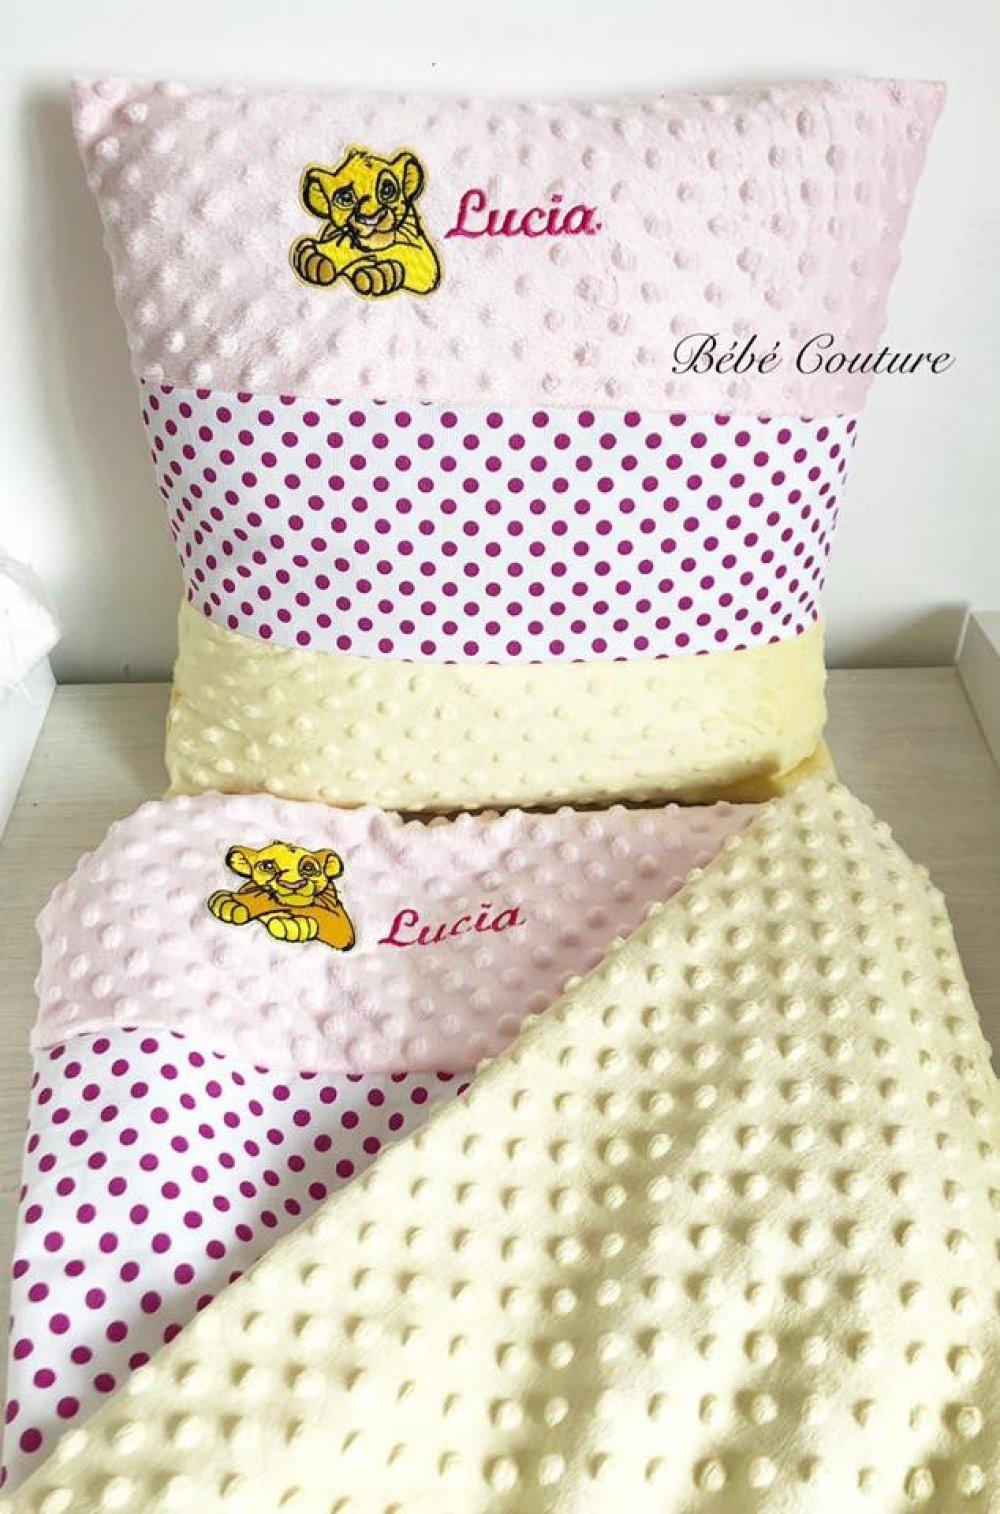 Taie D Oreiller A Personnaliser ❤️ ensemble sieste maternelle roi lion plaid+taie d'oreiller jaune à  personnaliser